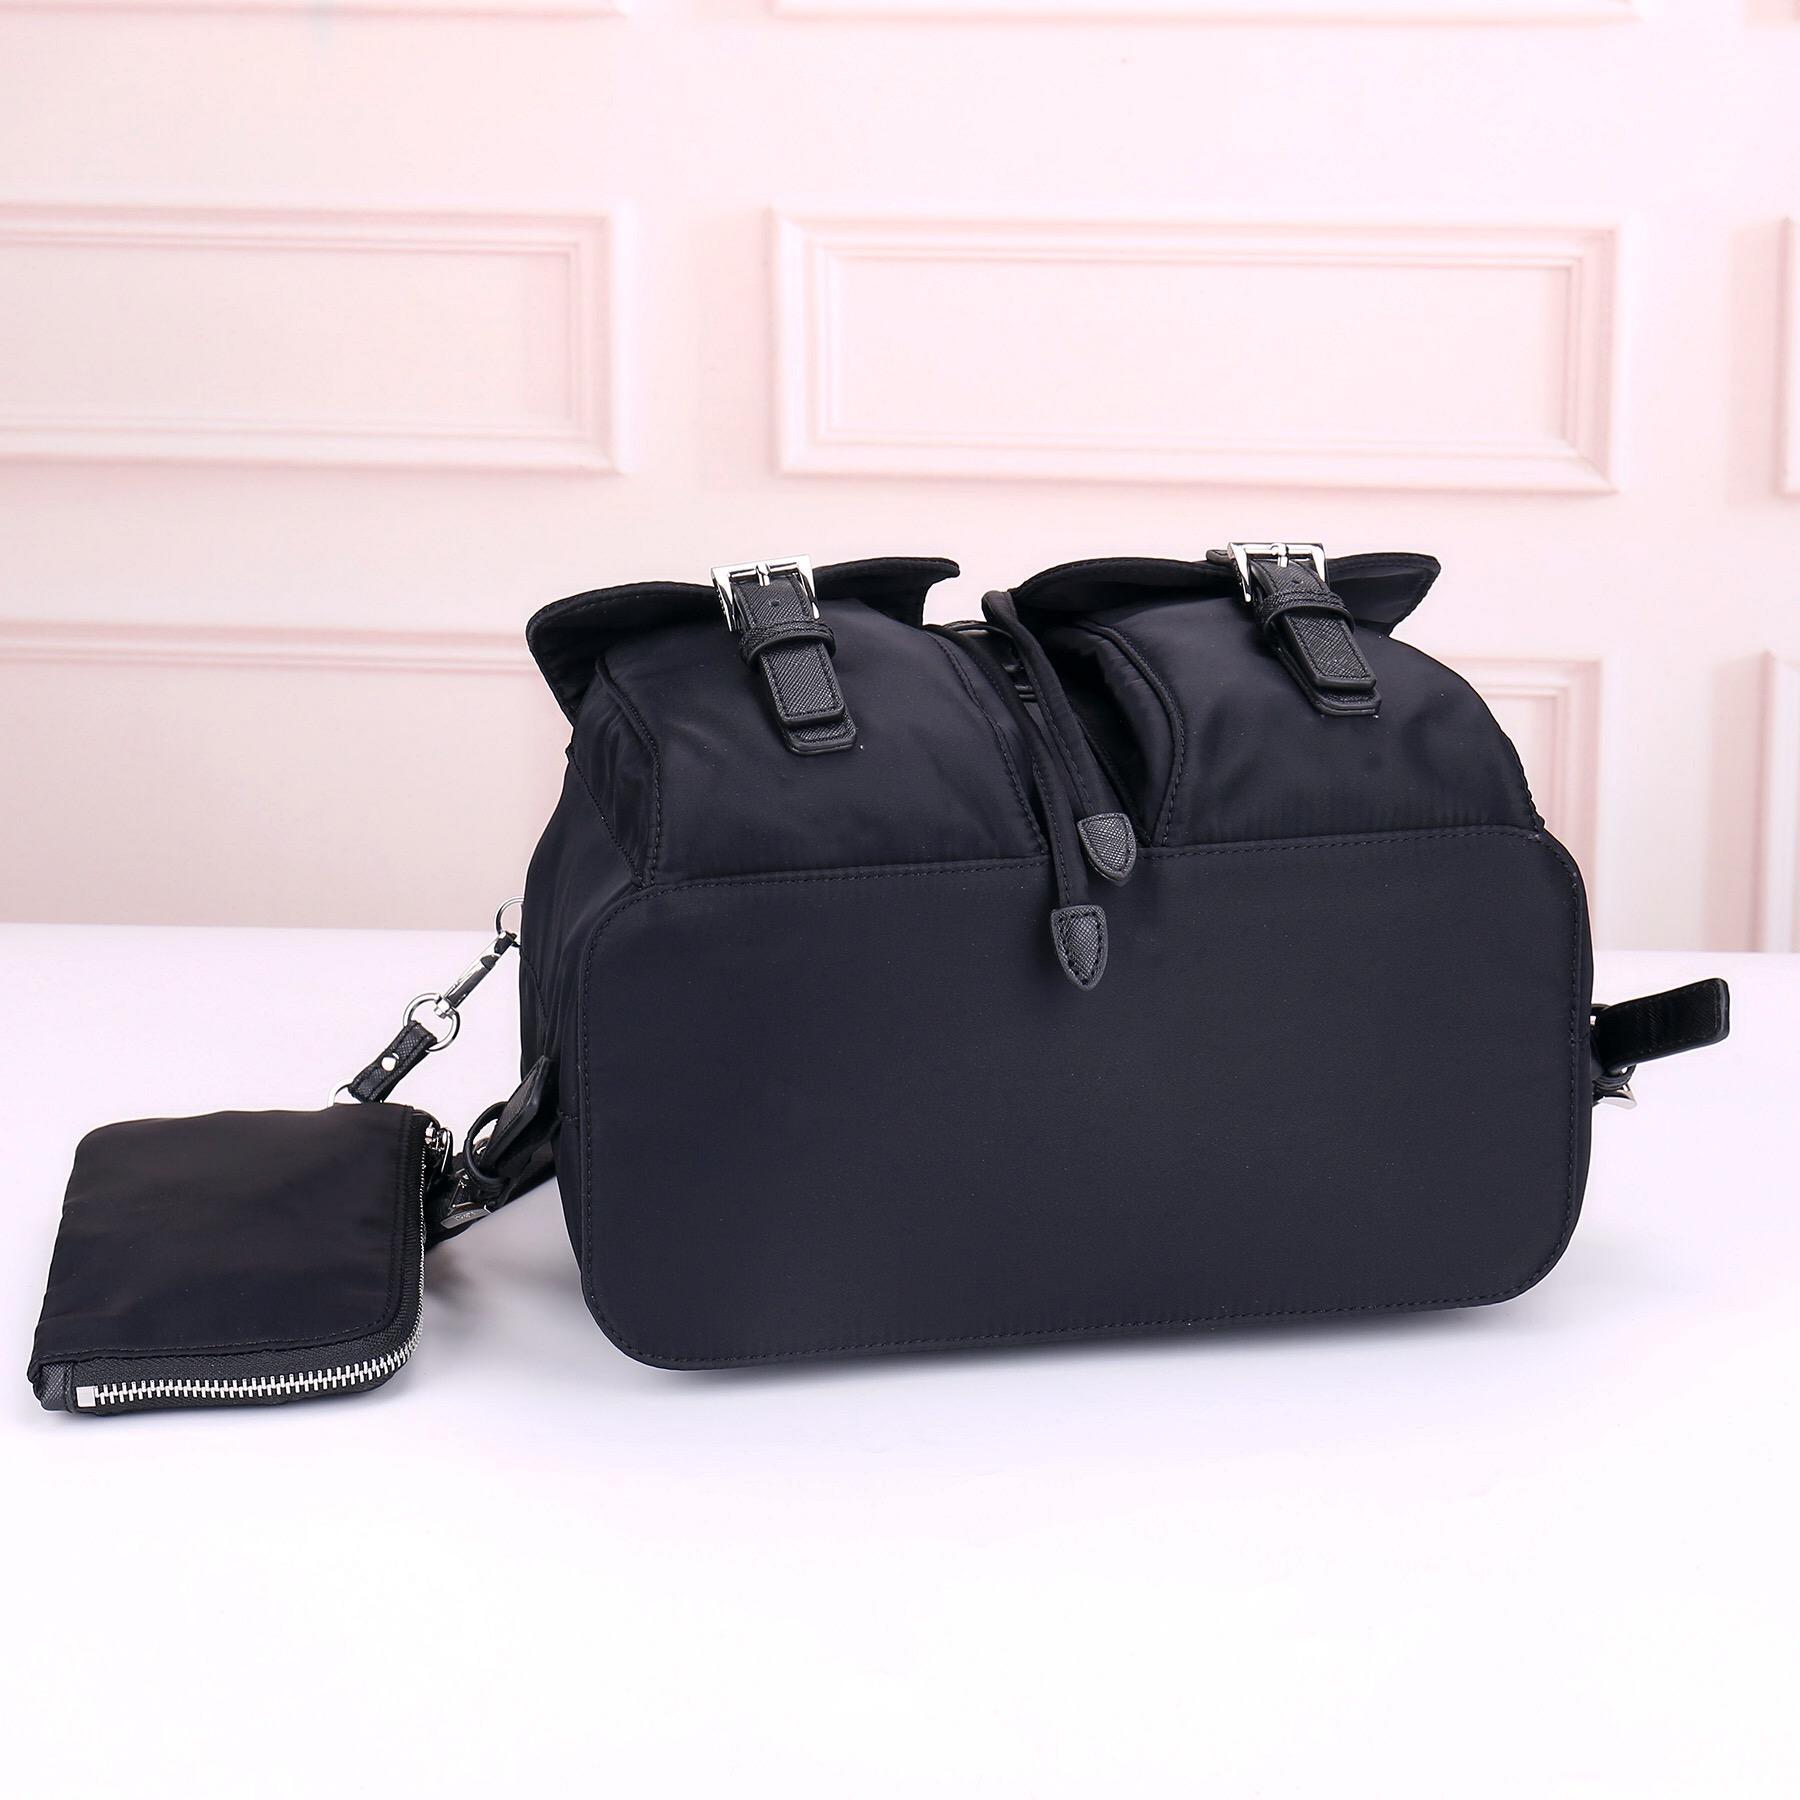 Indietro Moda Zaino Paracadute Donne Canvas per pacco all'ingrosso borsa da uomo borsa classica Spalla classica Messenger Fabs FEFAS